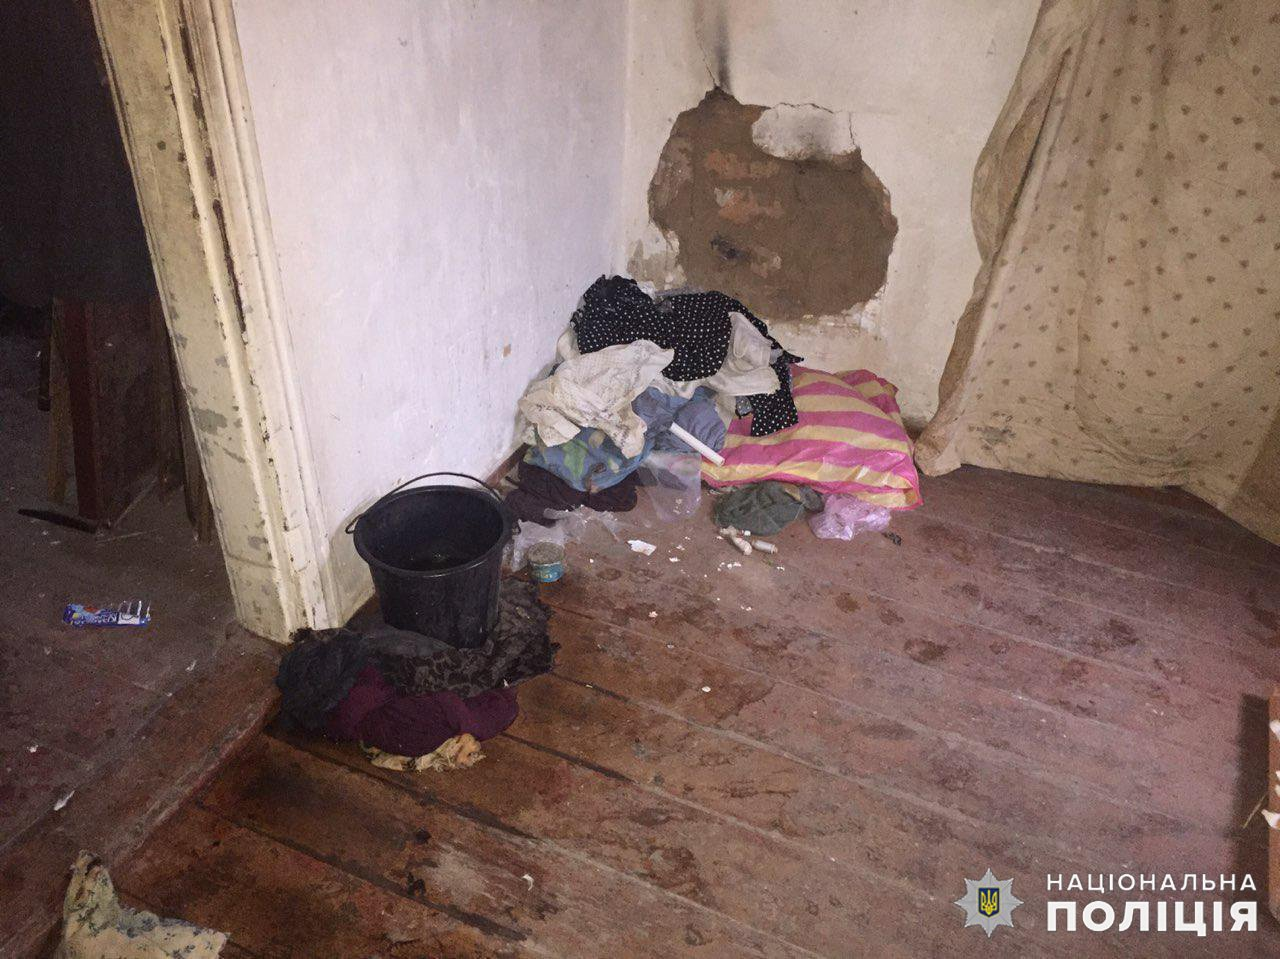 Дружковка: Родители 12-летней девочки готовят пищу на костре и попадают в дом через окно (ФОТО), фото-3